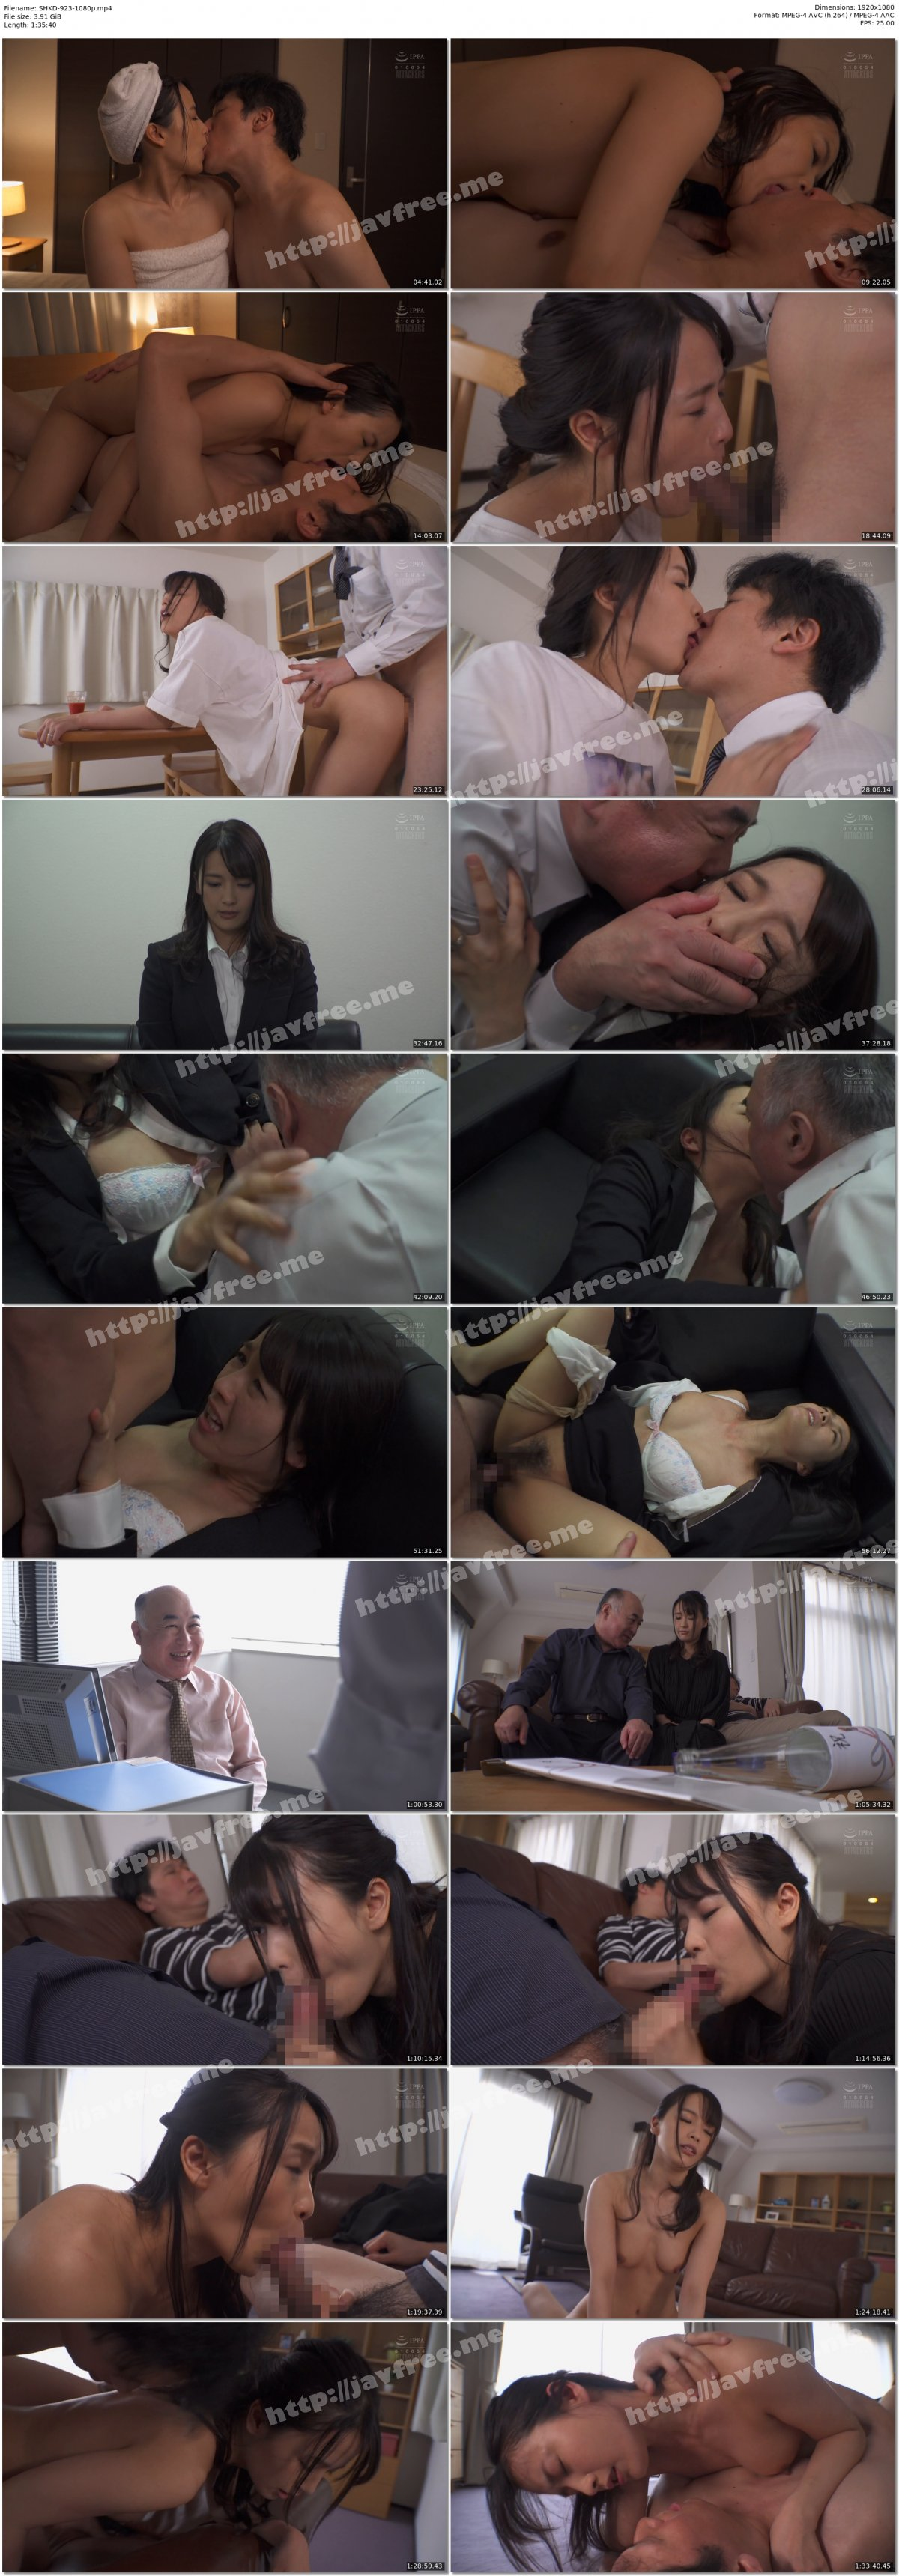 [HD][SHKD-923] 妊活中にレ●プされた人妻は身籠った時に何を願うのか… 向井藍 - image SHKD-923-1080p on https://javfree.me